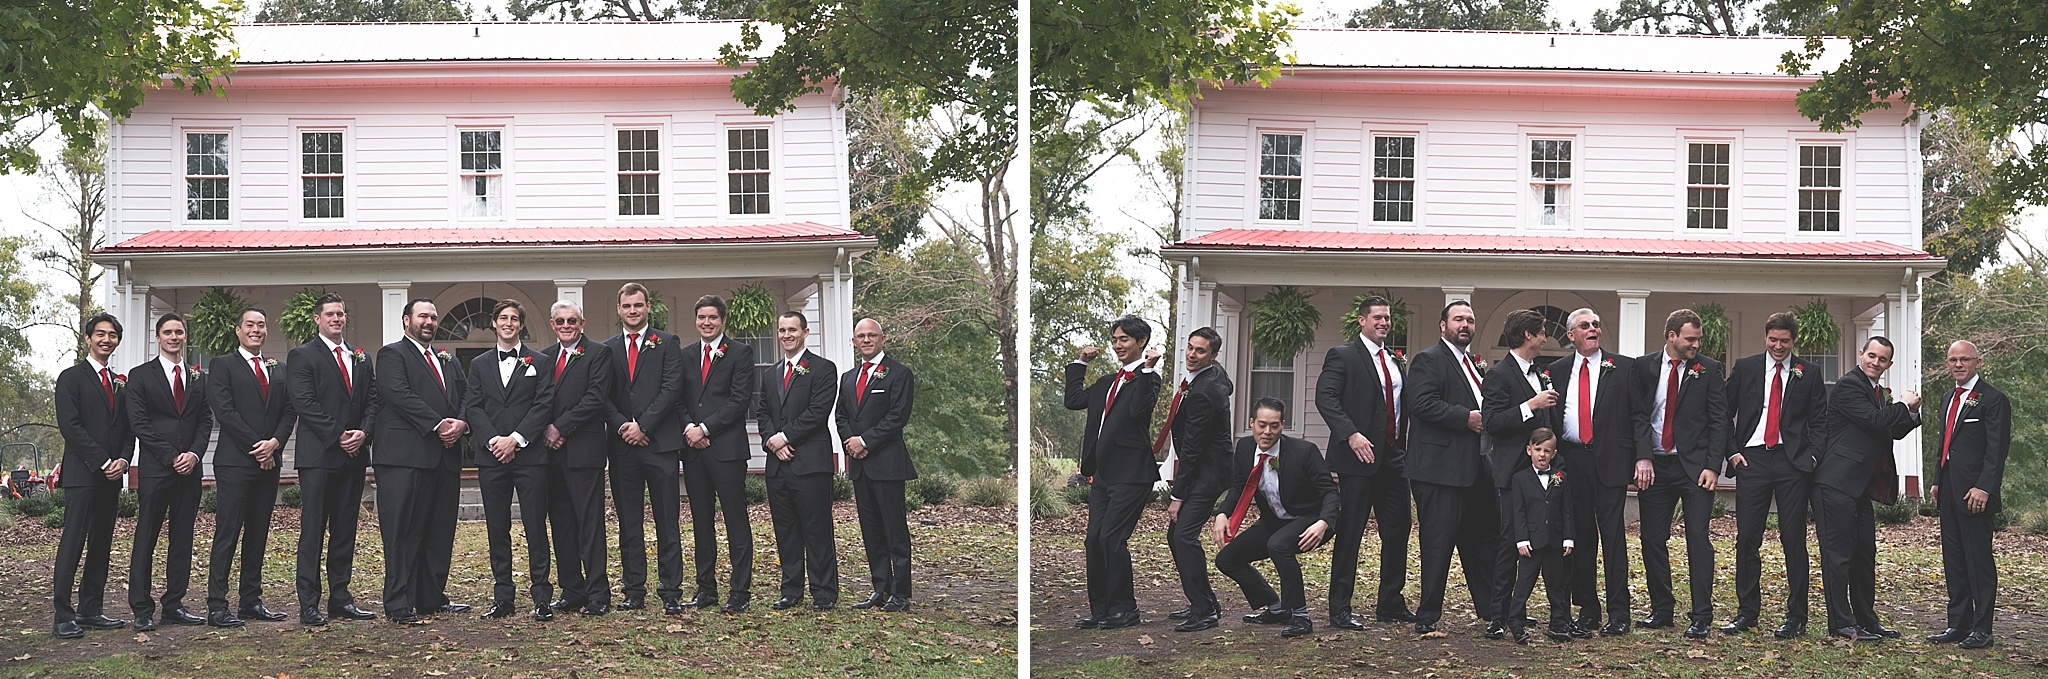 Grantham-House-Wedding-Photogrpaher-014.jpg